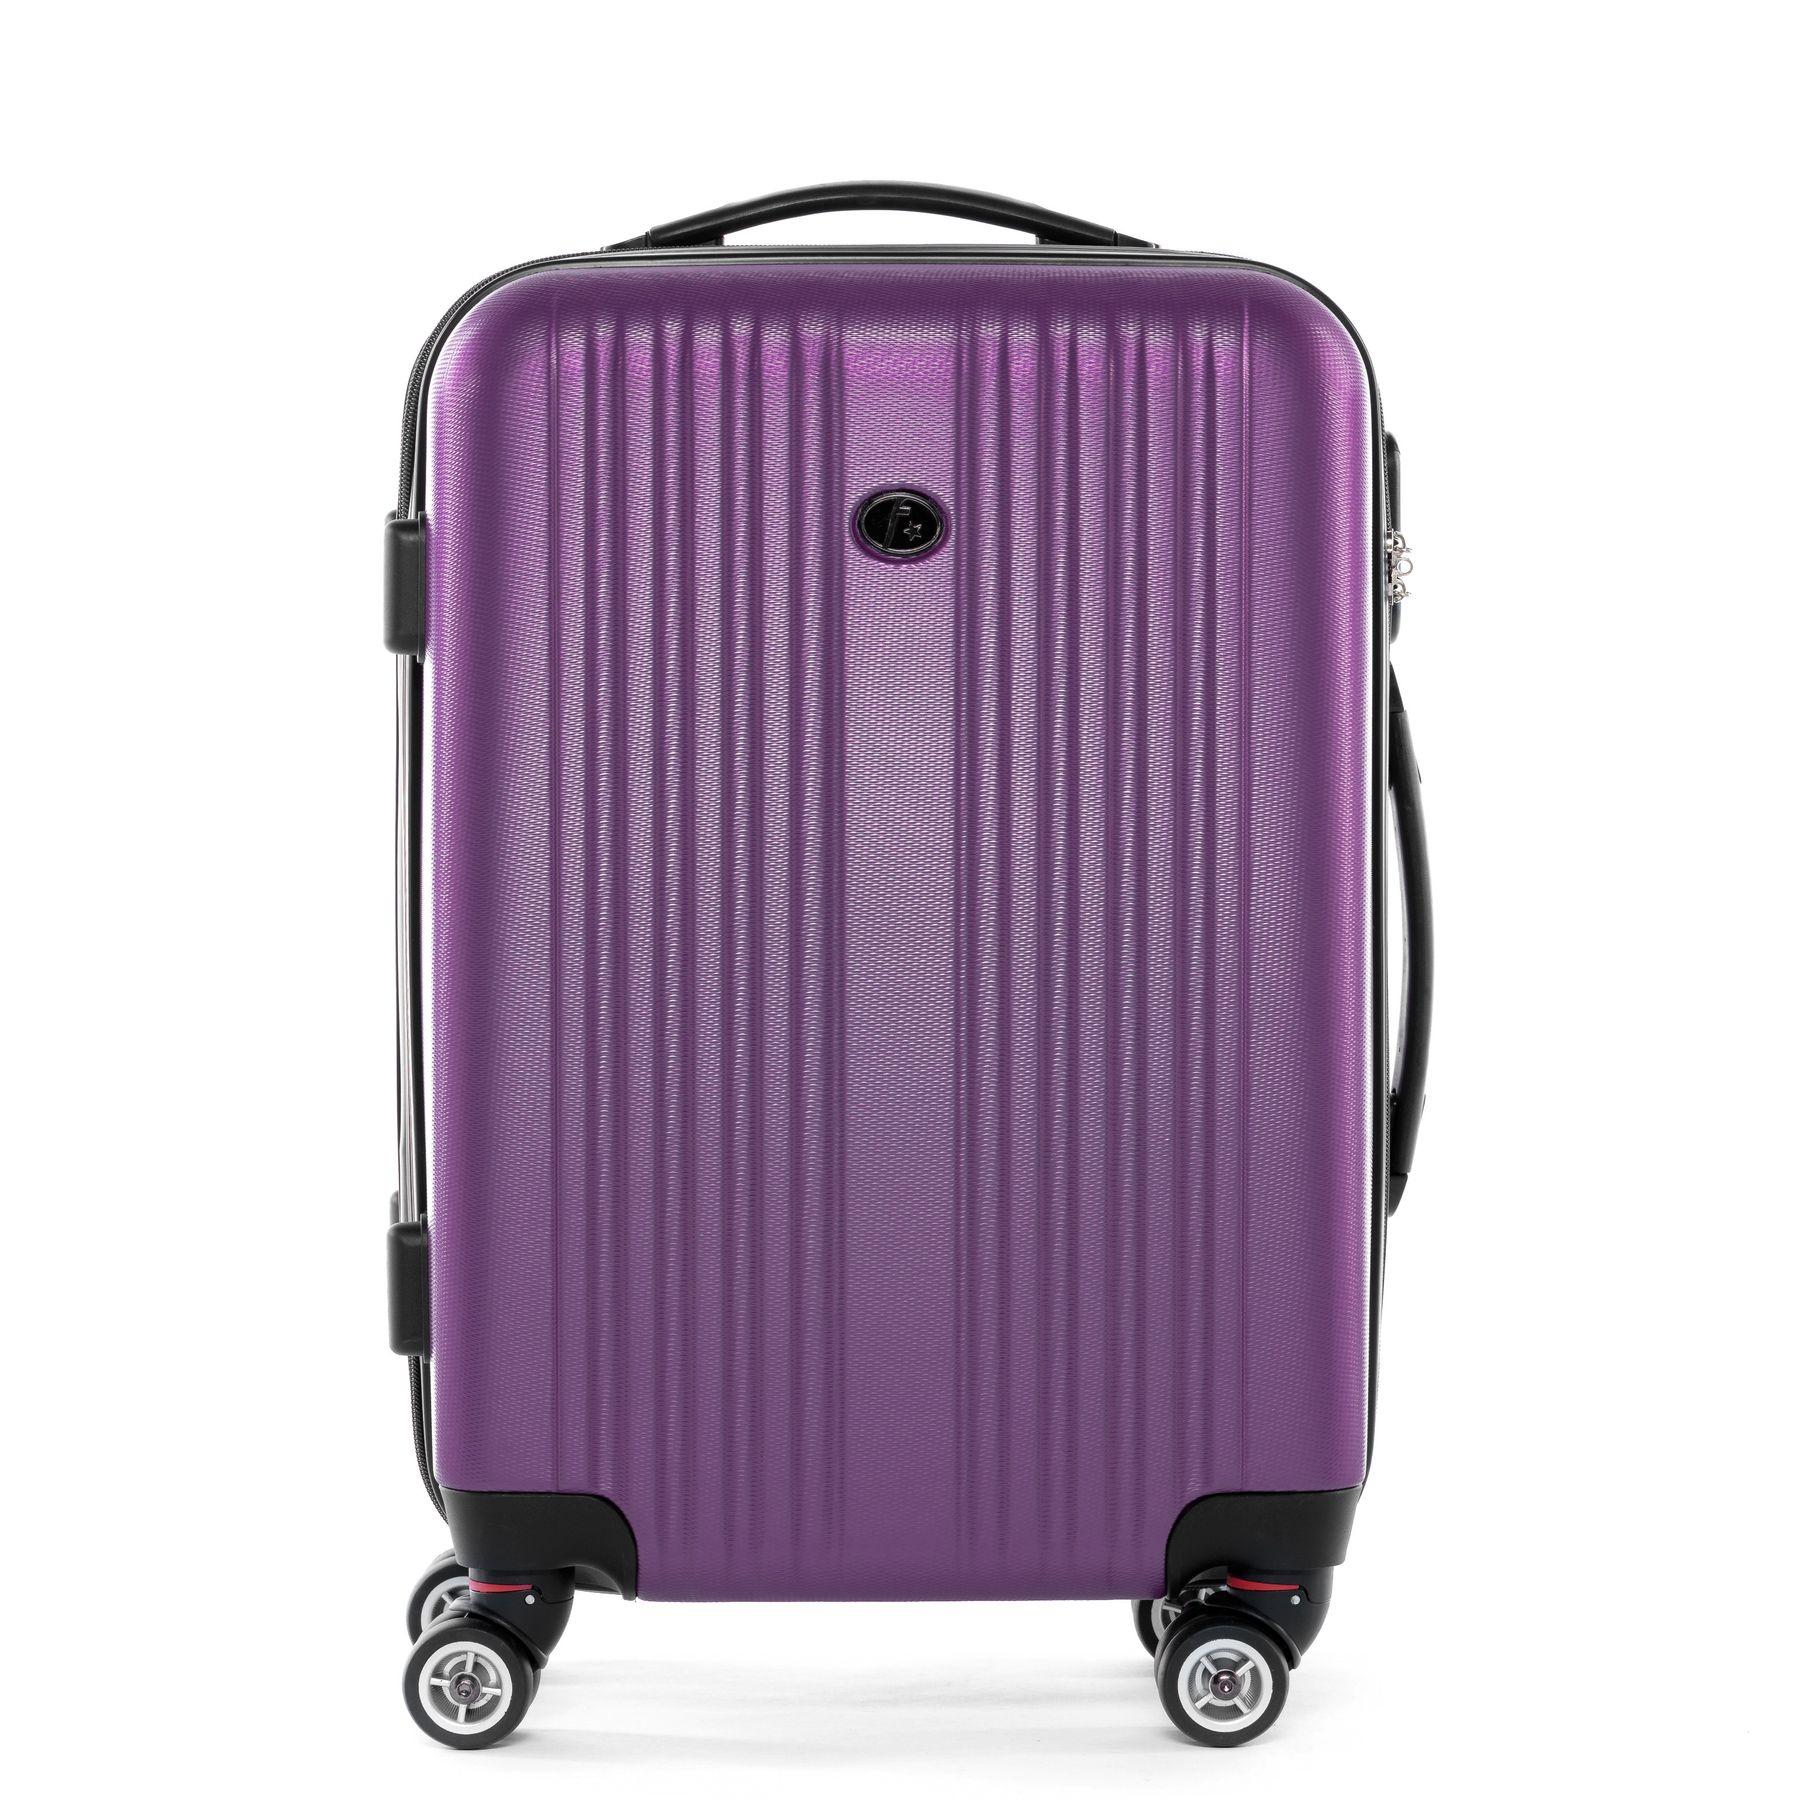 handgep ck hartschalen koffer trolley kabinen bordgep ck. Black Bedroom Furniture Sets. Home Design Ideas